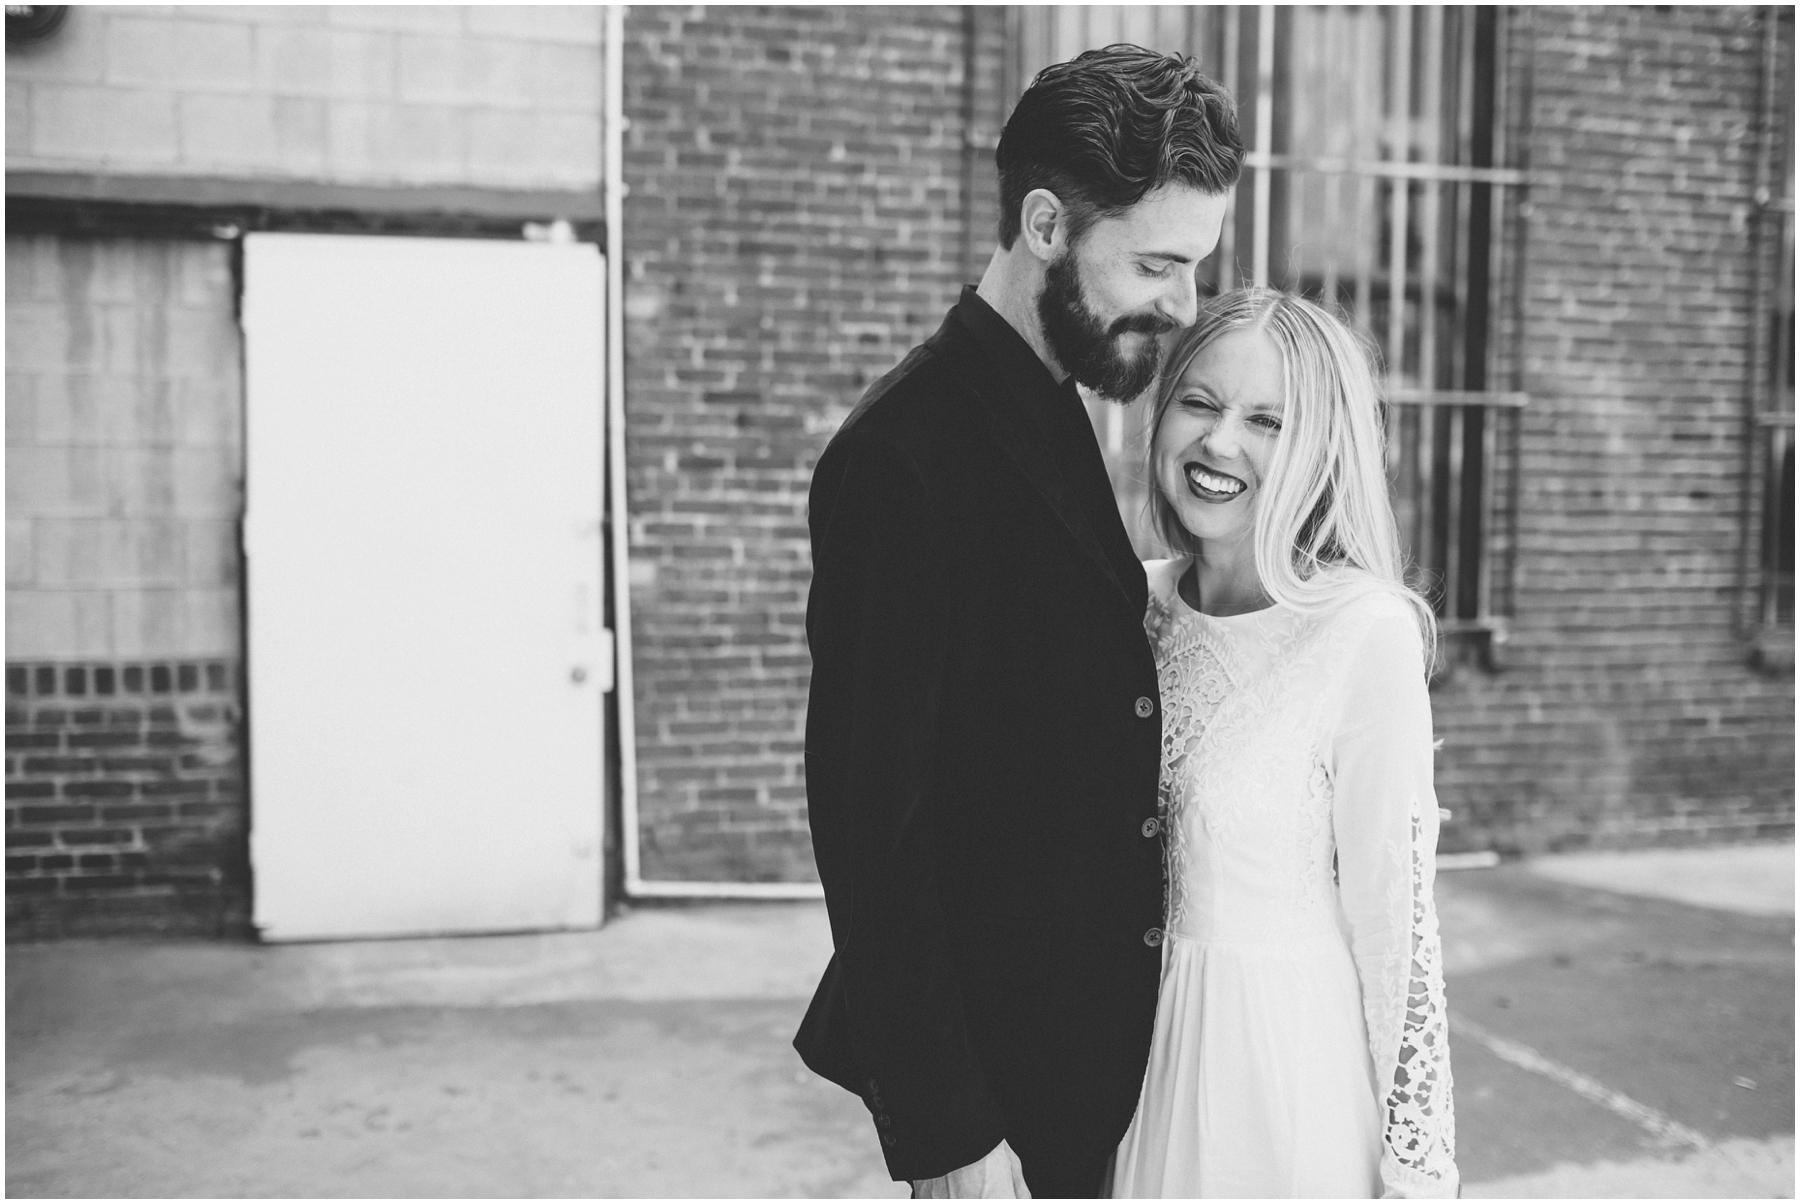 Natalie+Corey-WEDDING_KELLYBOITANO_0037